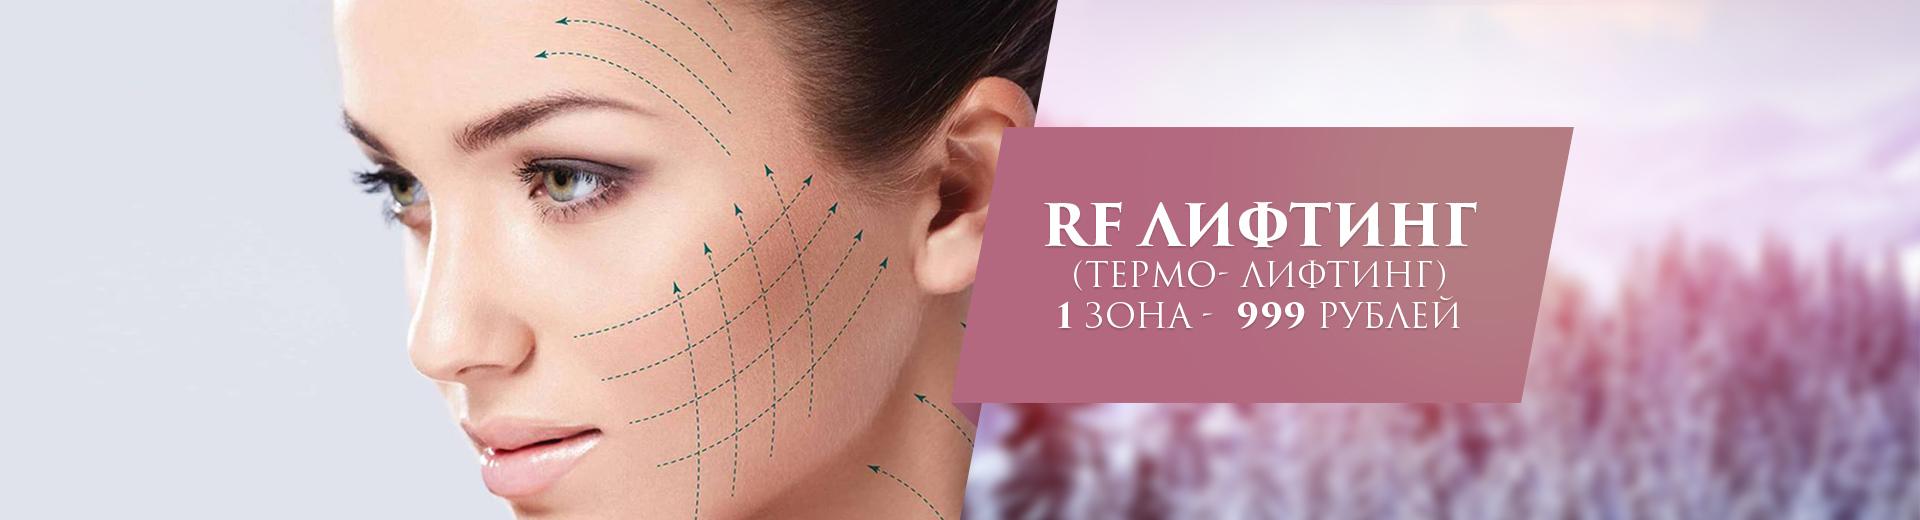 RF лифтинг 1 зона - 999 рублей